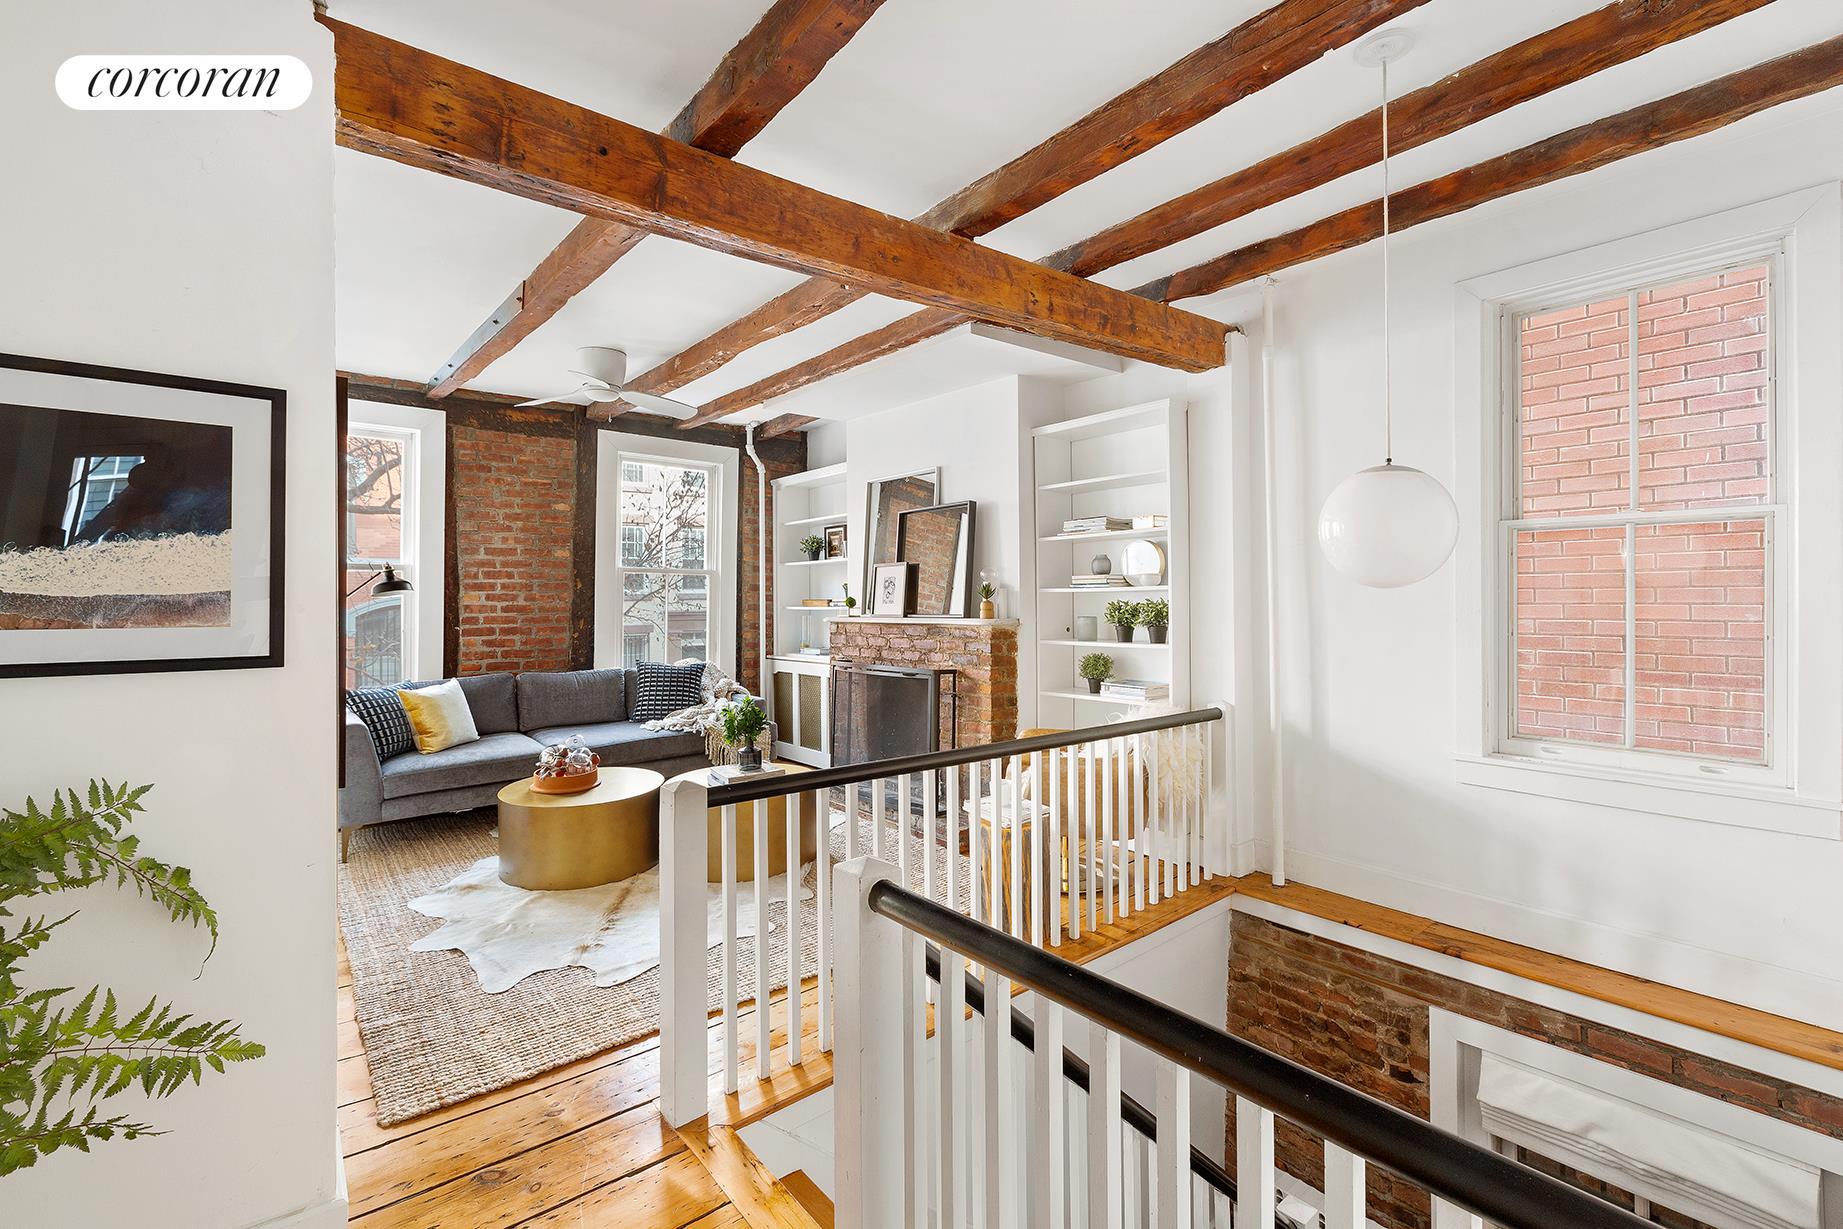 Apartment for sale at 80 Poplar Street, Apt 1F